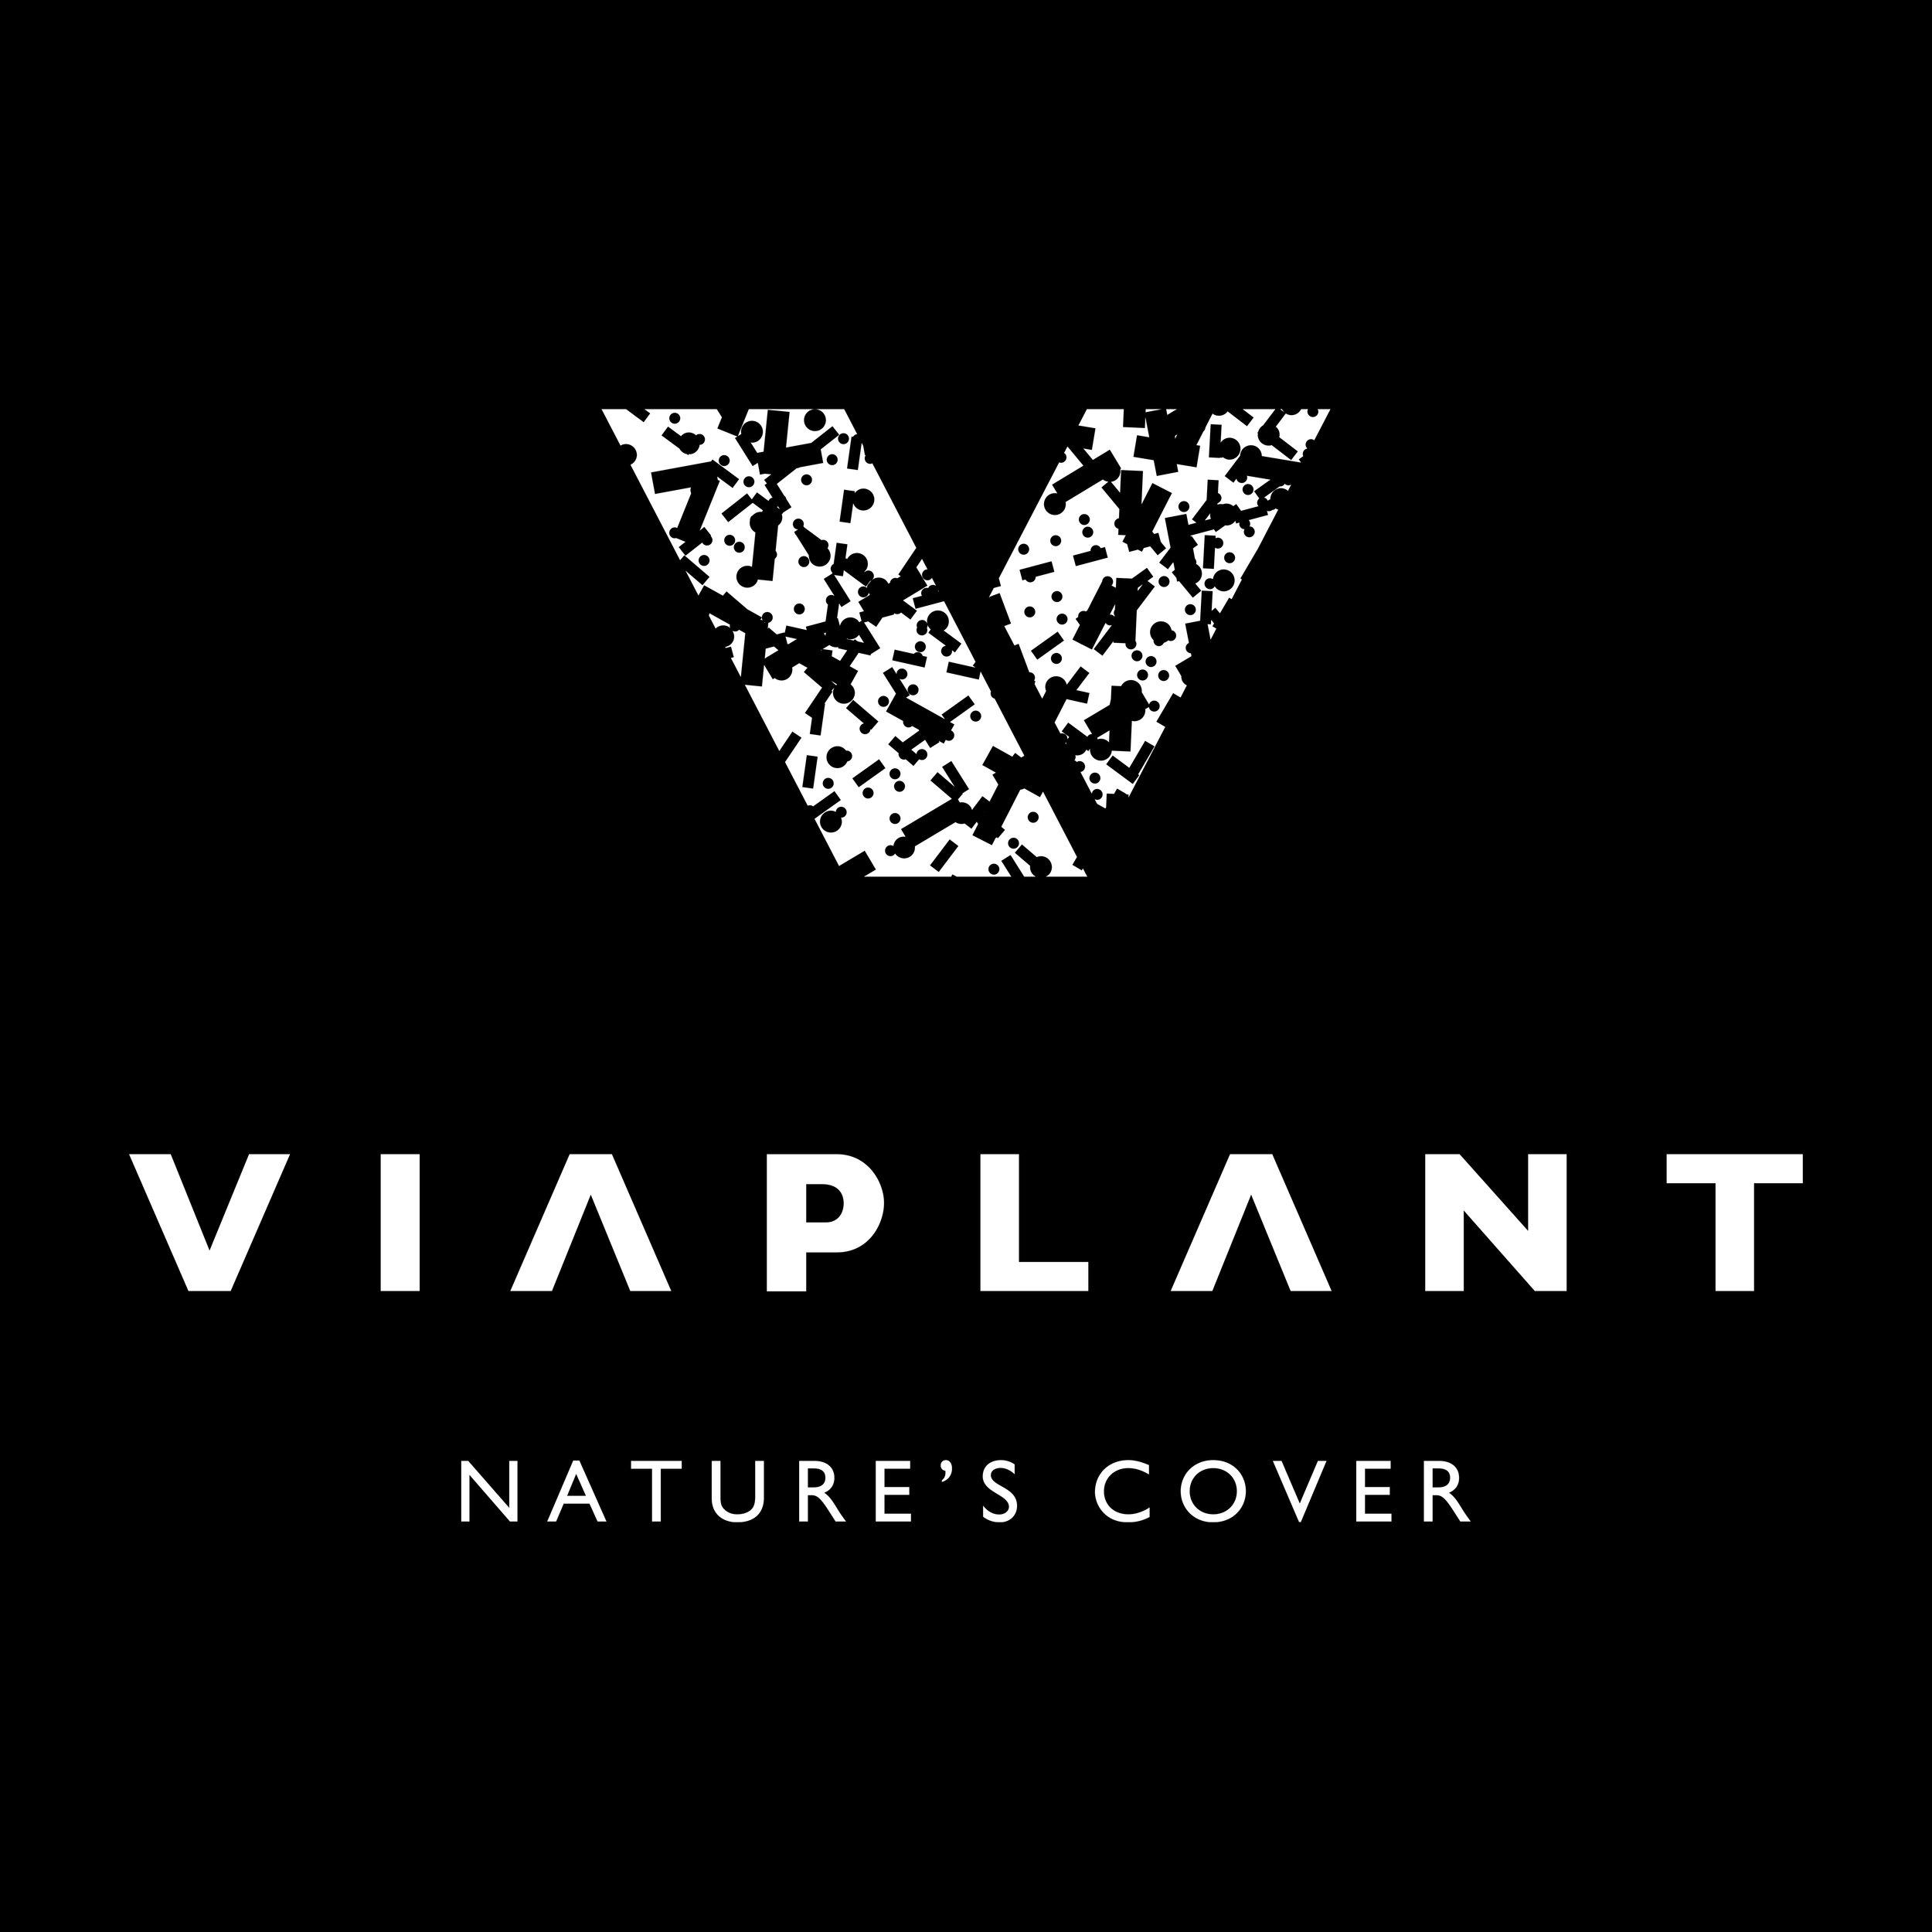 Viaplant_logo_felirattal.jpg